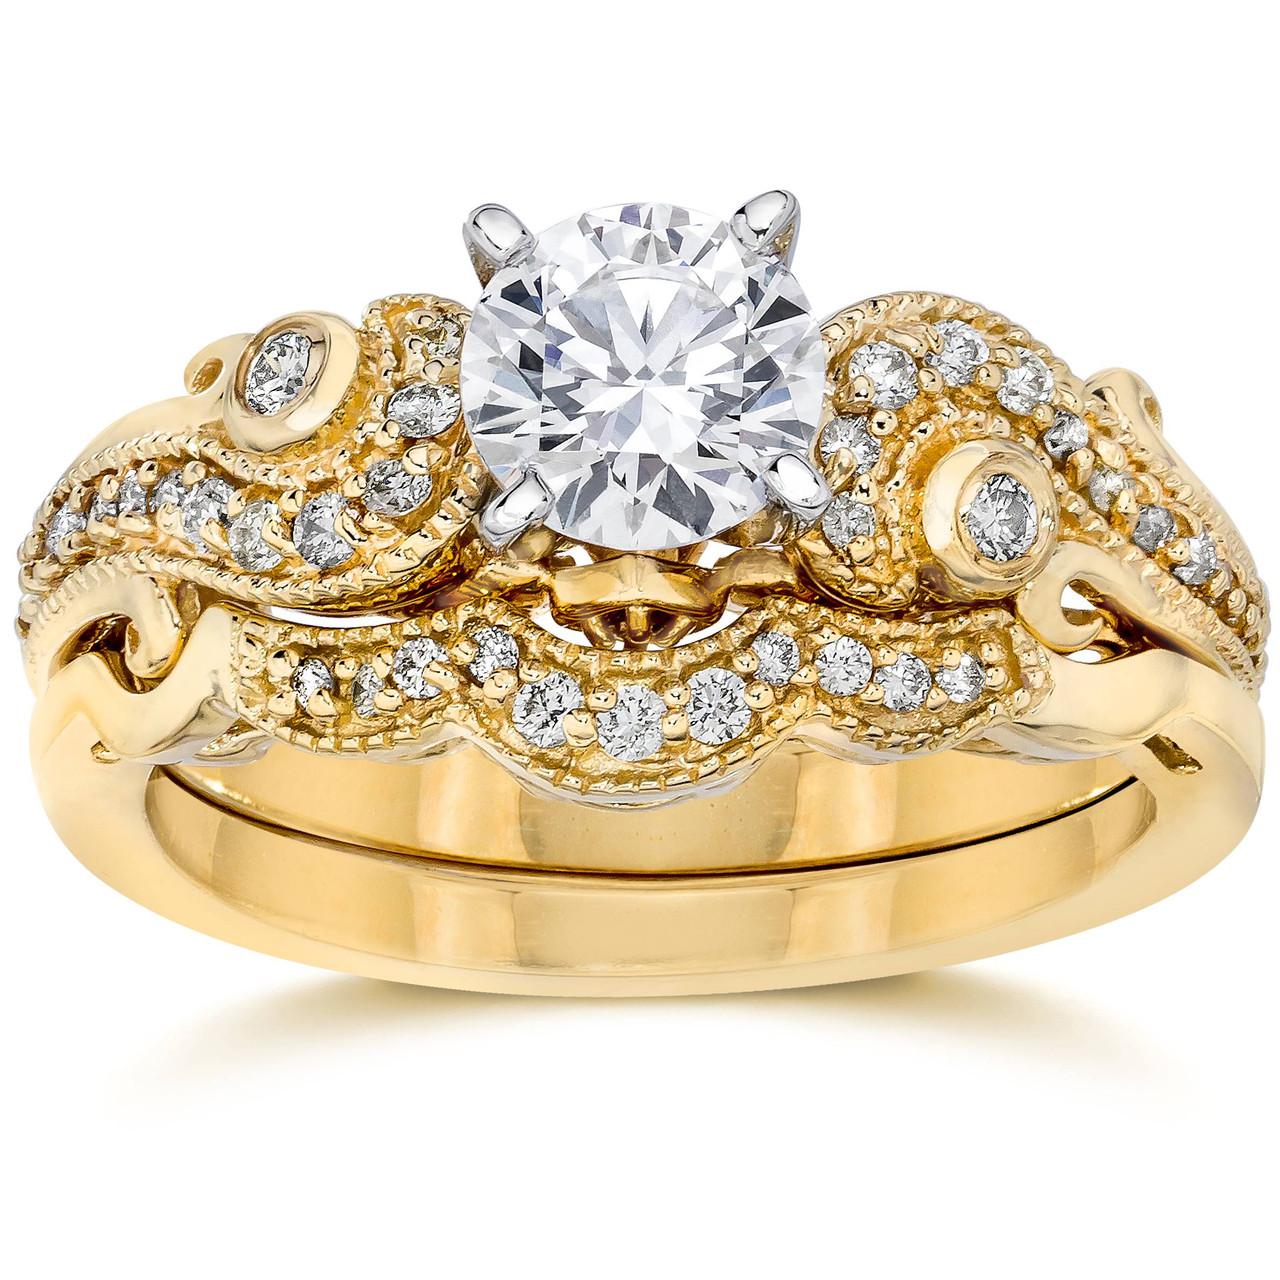 Emery 3/4Ct Vintage Diamond Engagement Wedding Ring Set 14K Yellow